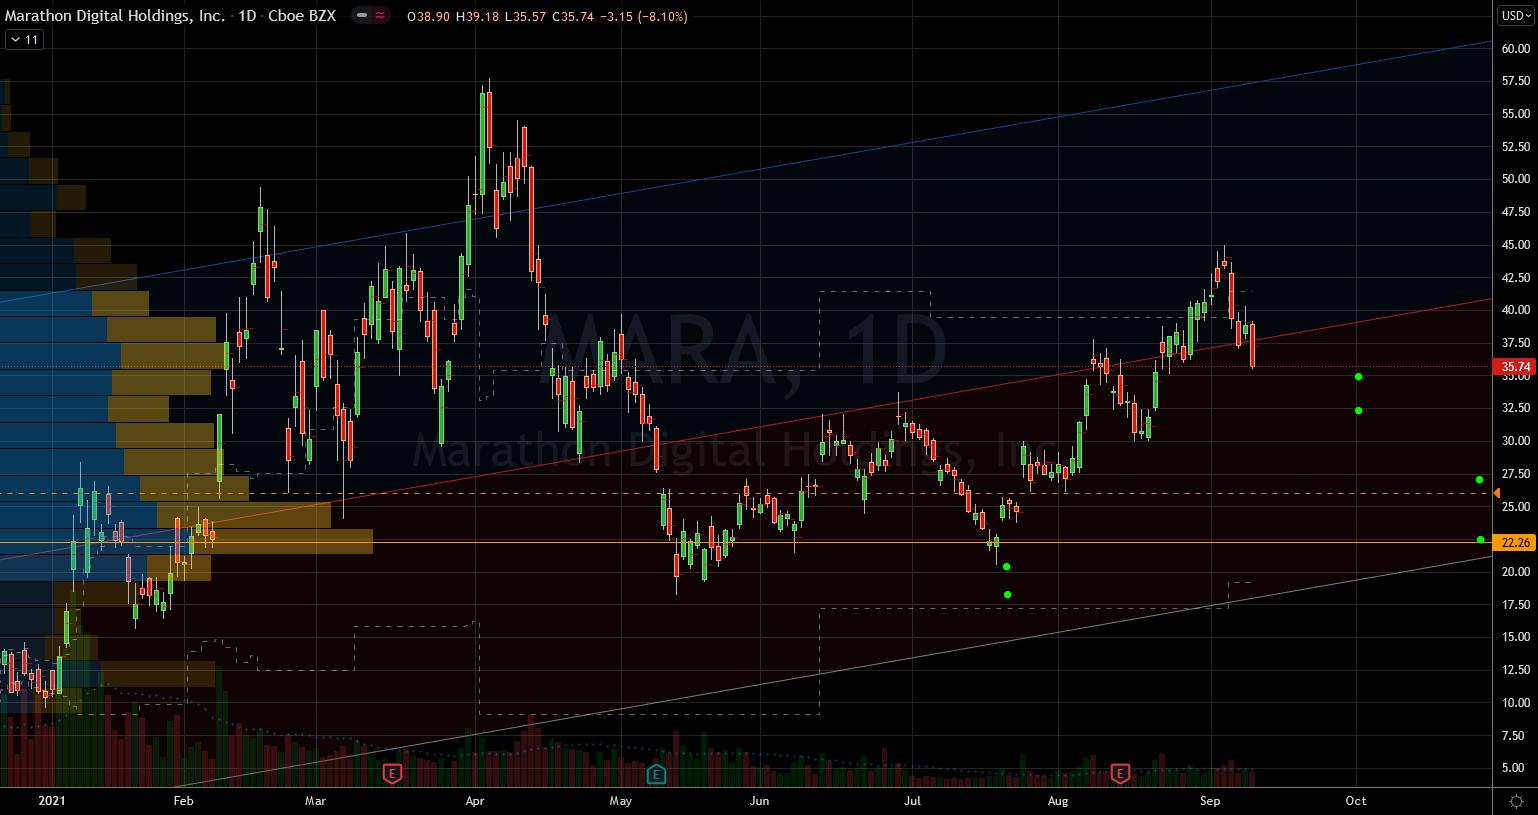 Stocks to Buy: Marathon Digital Holdings (MARA) Stock Chart Showing Potential Base